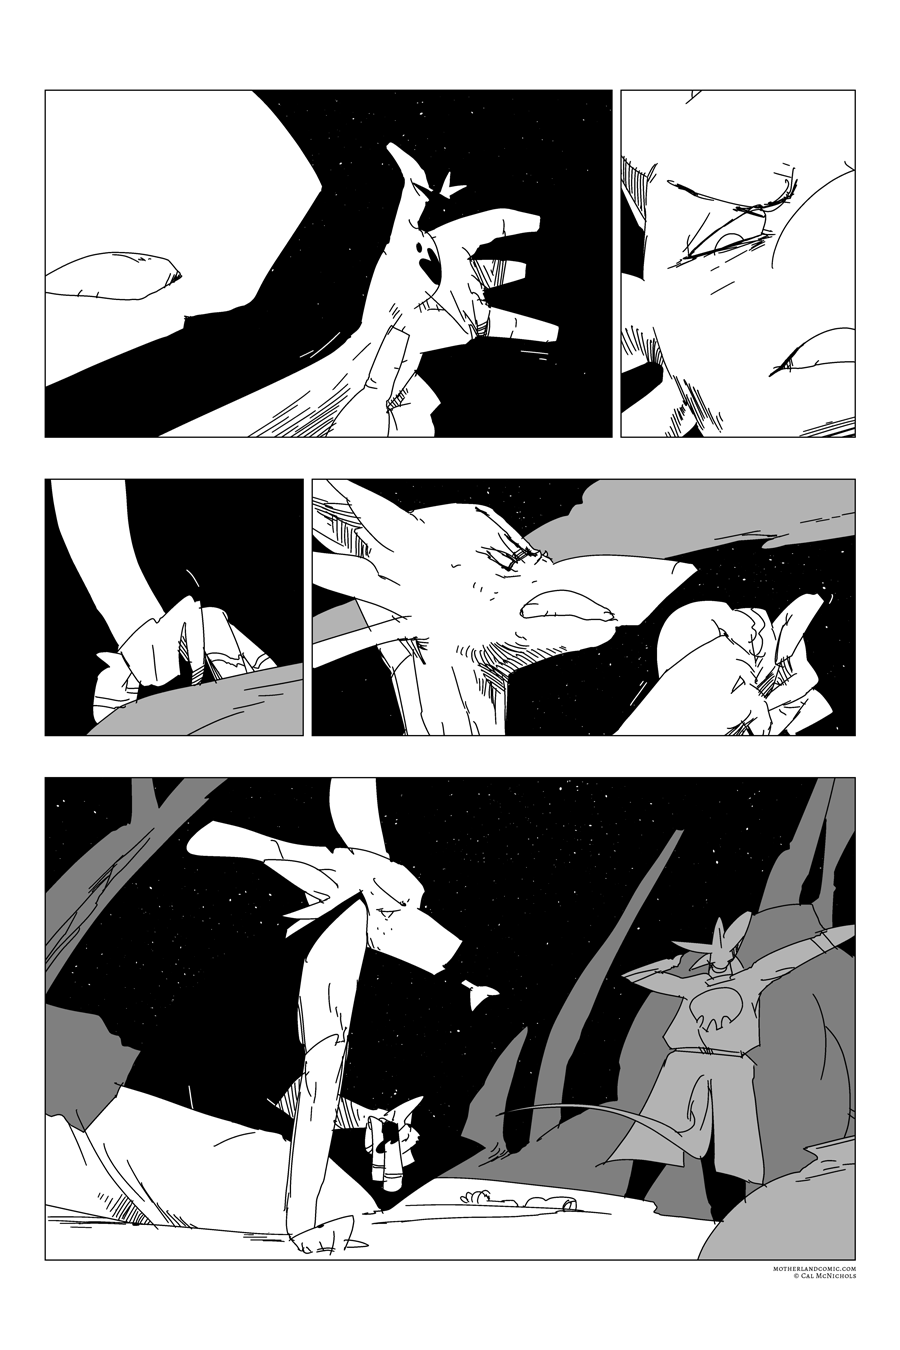 pg 105